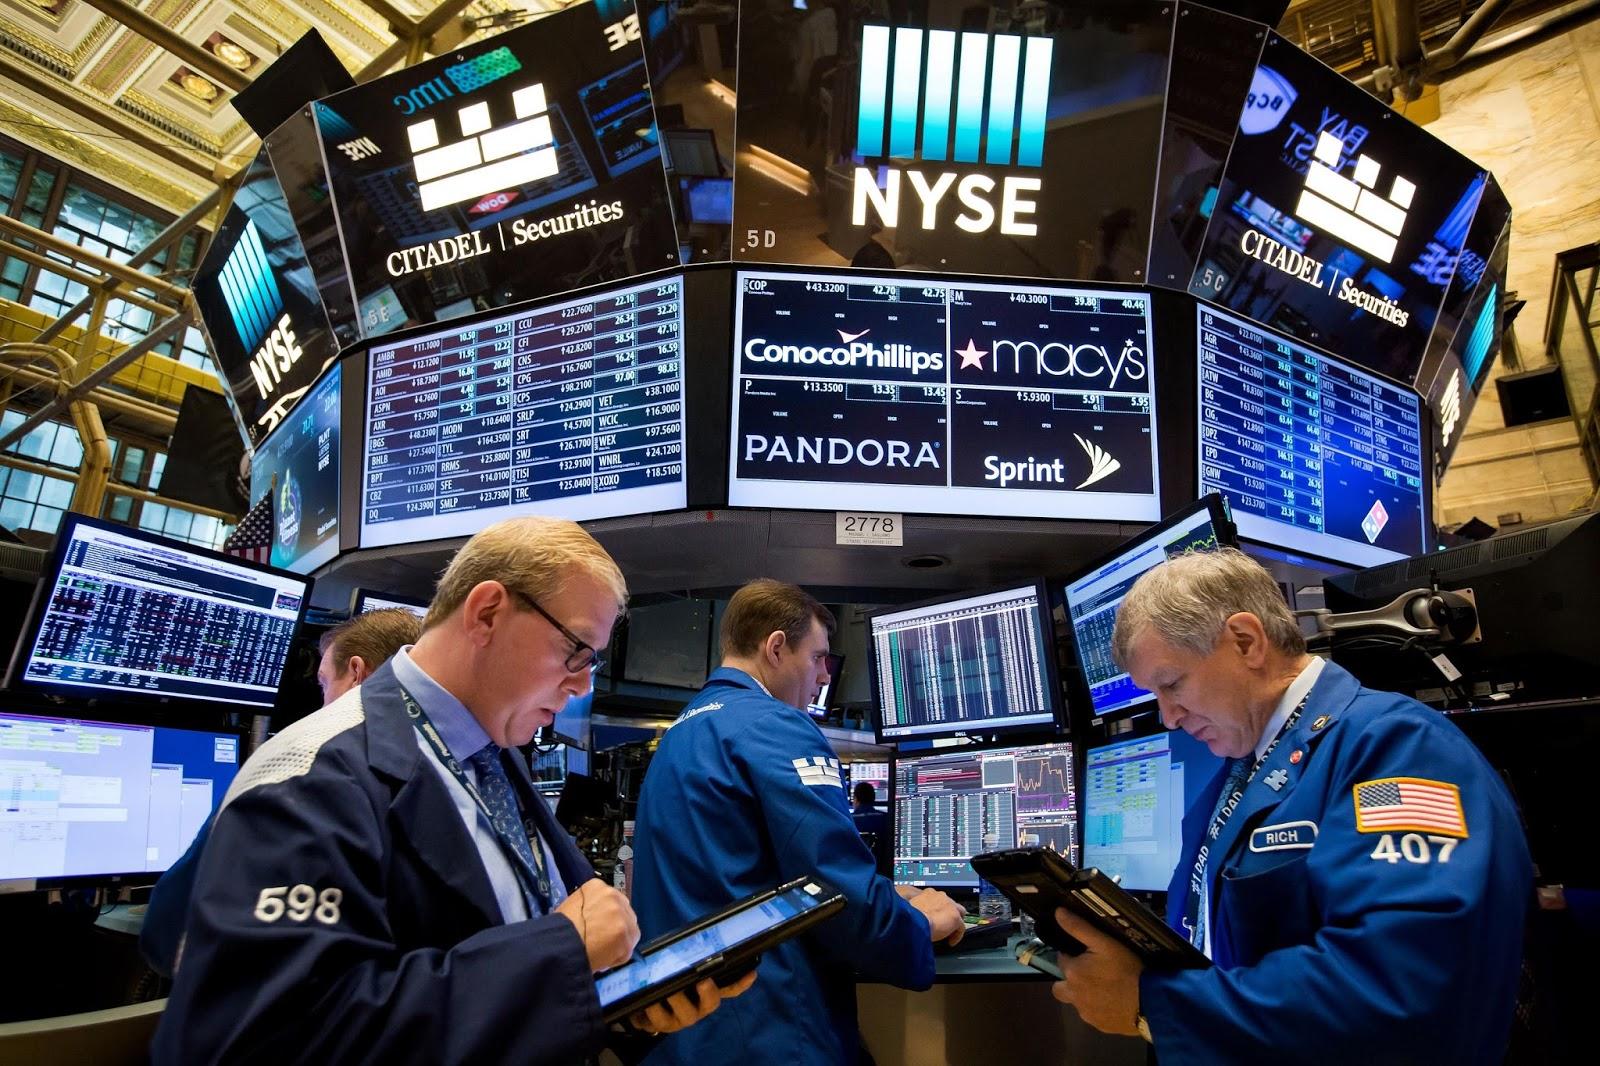 U.S. Stocks Rebound to Best Weekly Gain Since 2013: Markets Wrap